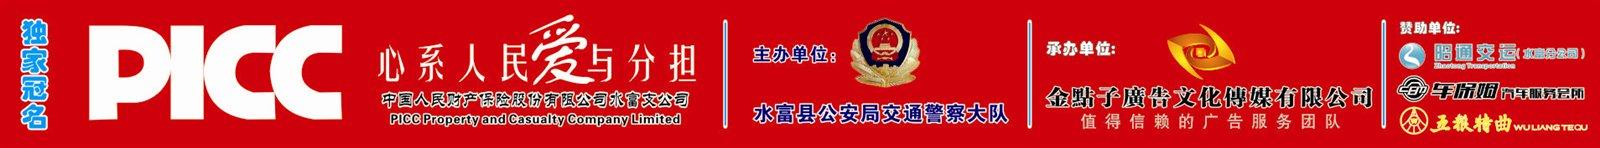 http://p4.pccoo.cn/vote/20160705/2016070515223485643999.jpg